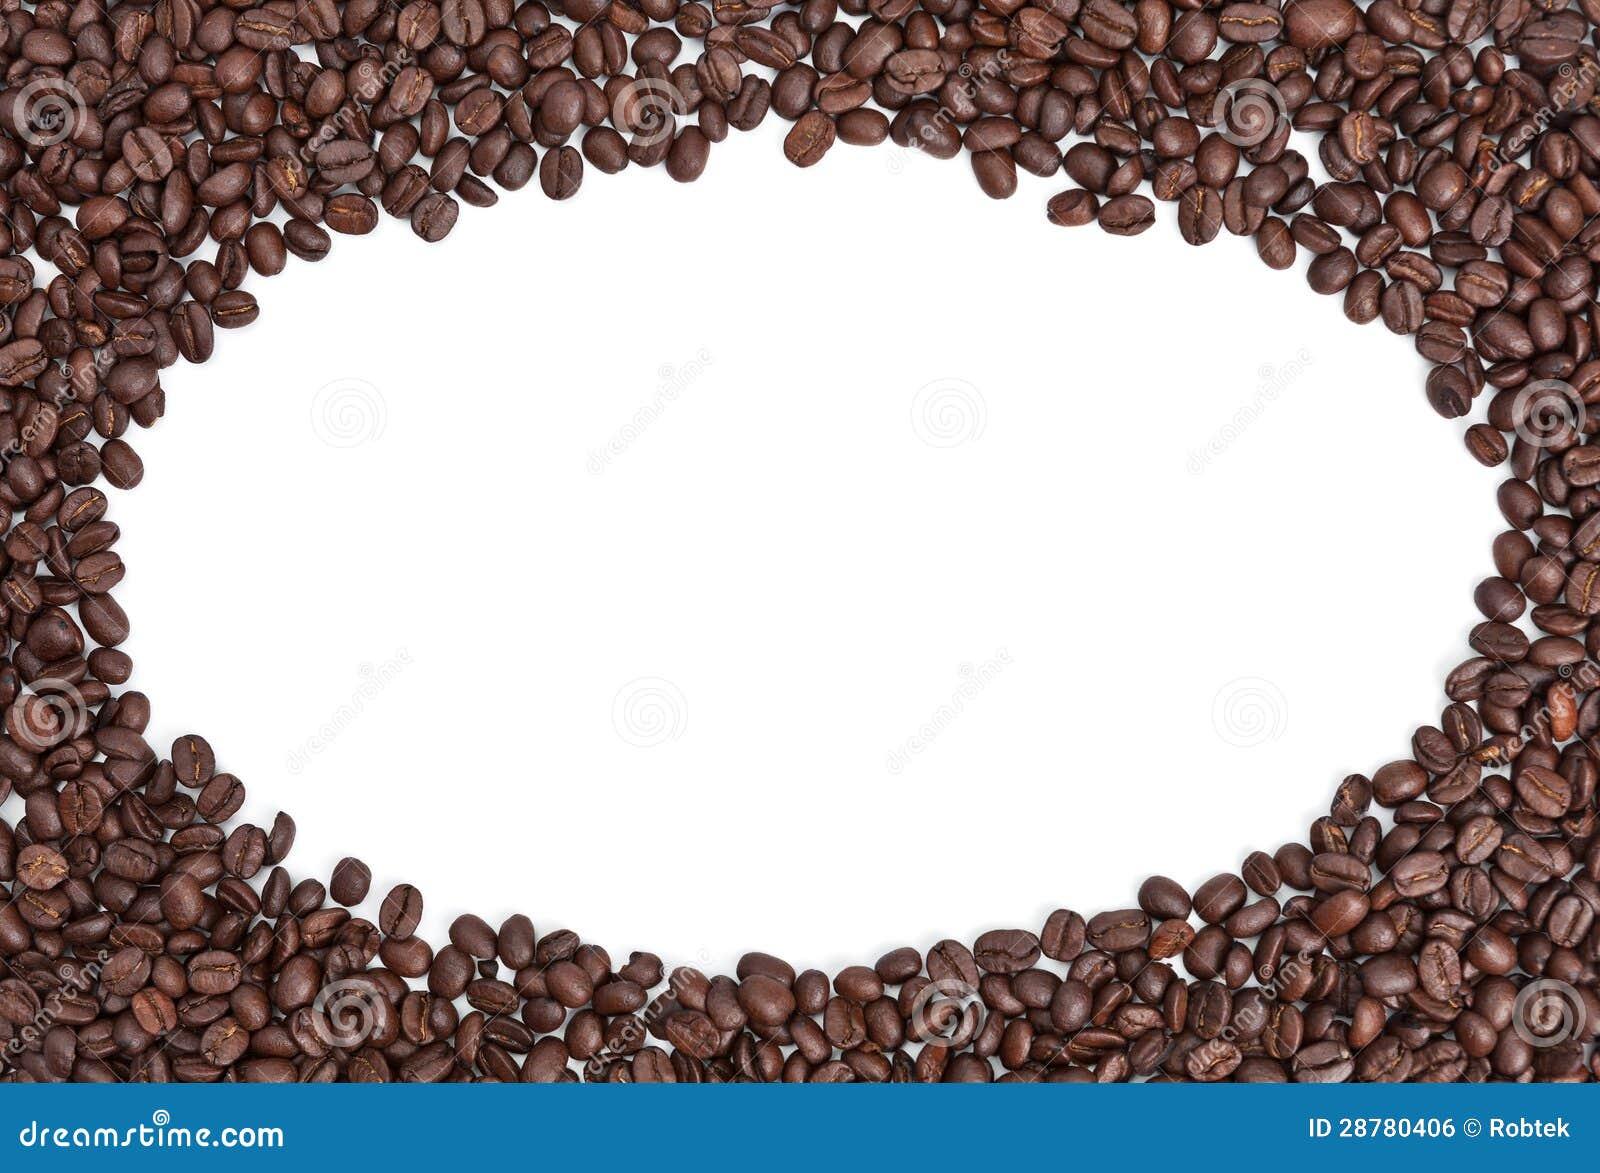 Coffee Bean Border ~ Coffee bean border stock photo image of brown copy